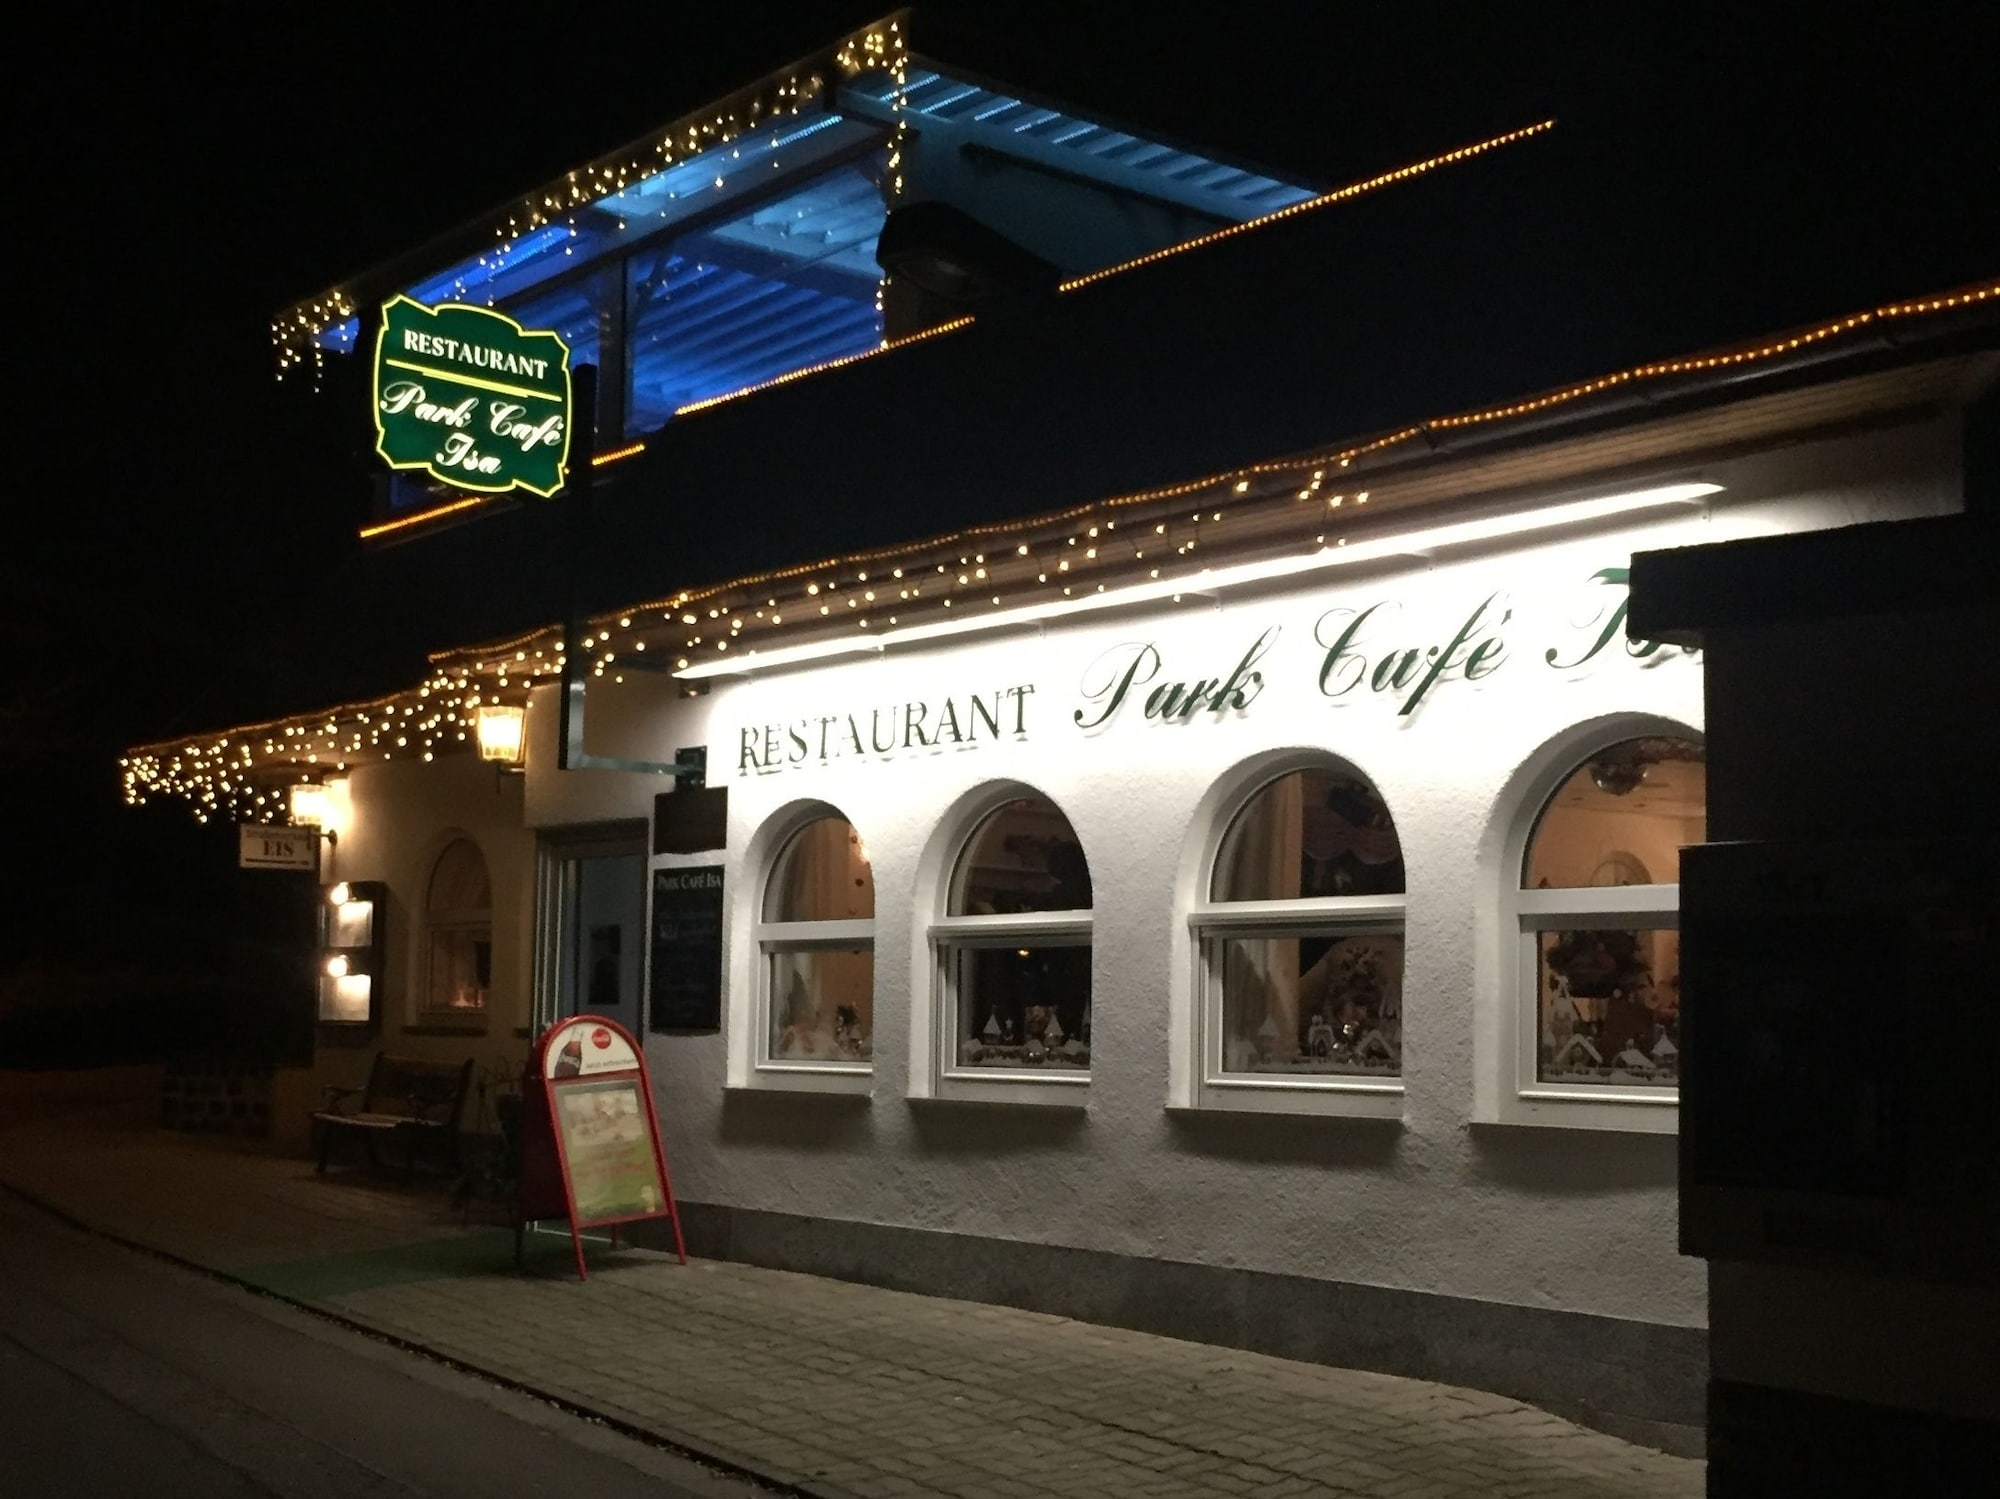 Hotel & Restaurant Park-Cafe ISA, Erfurt